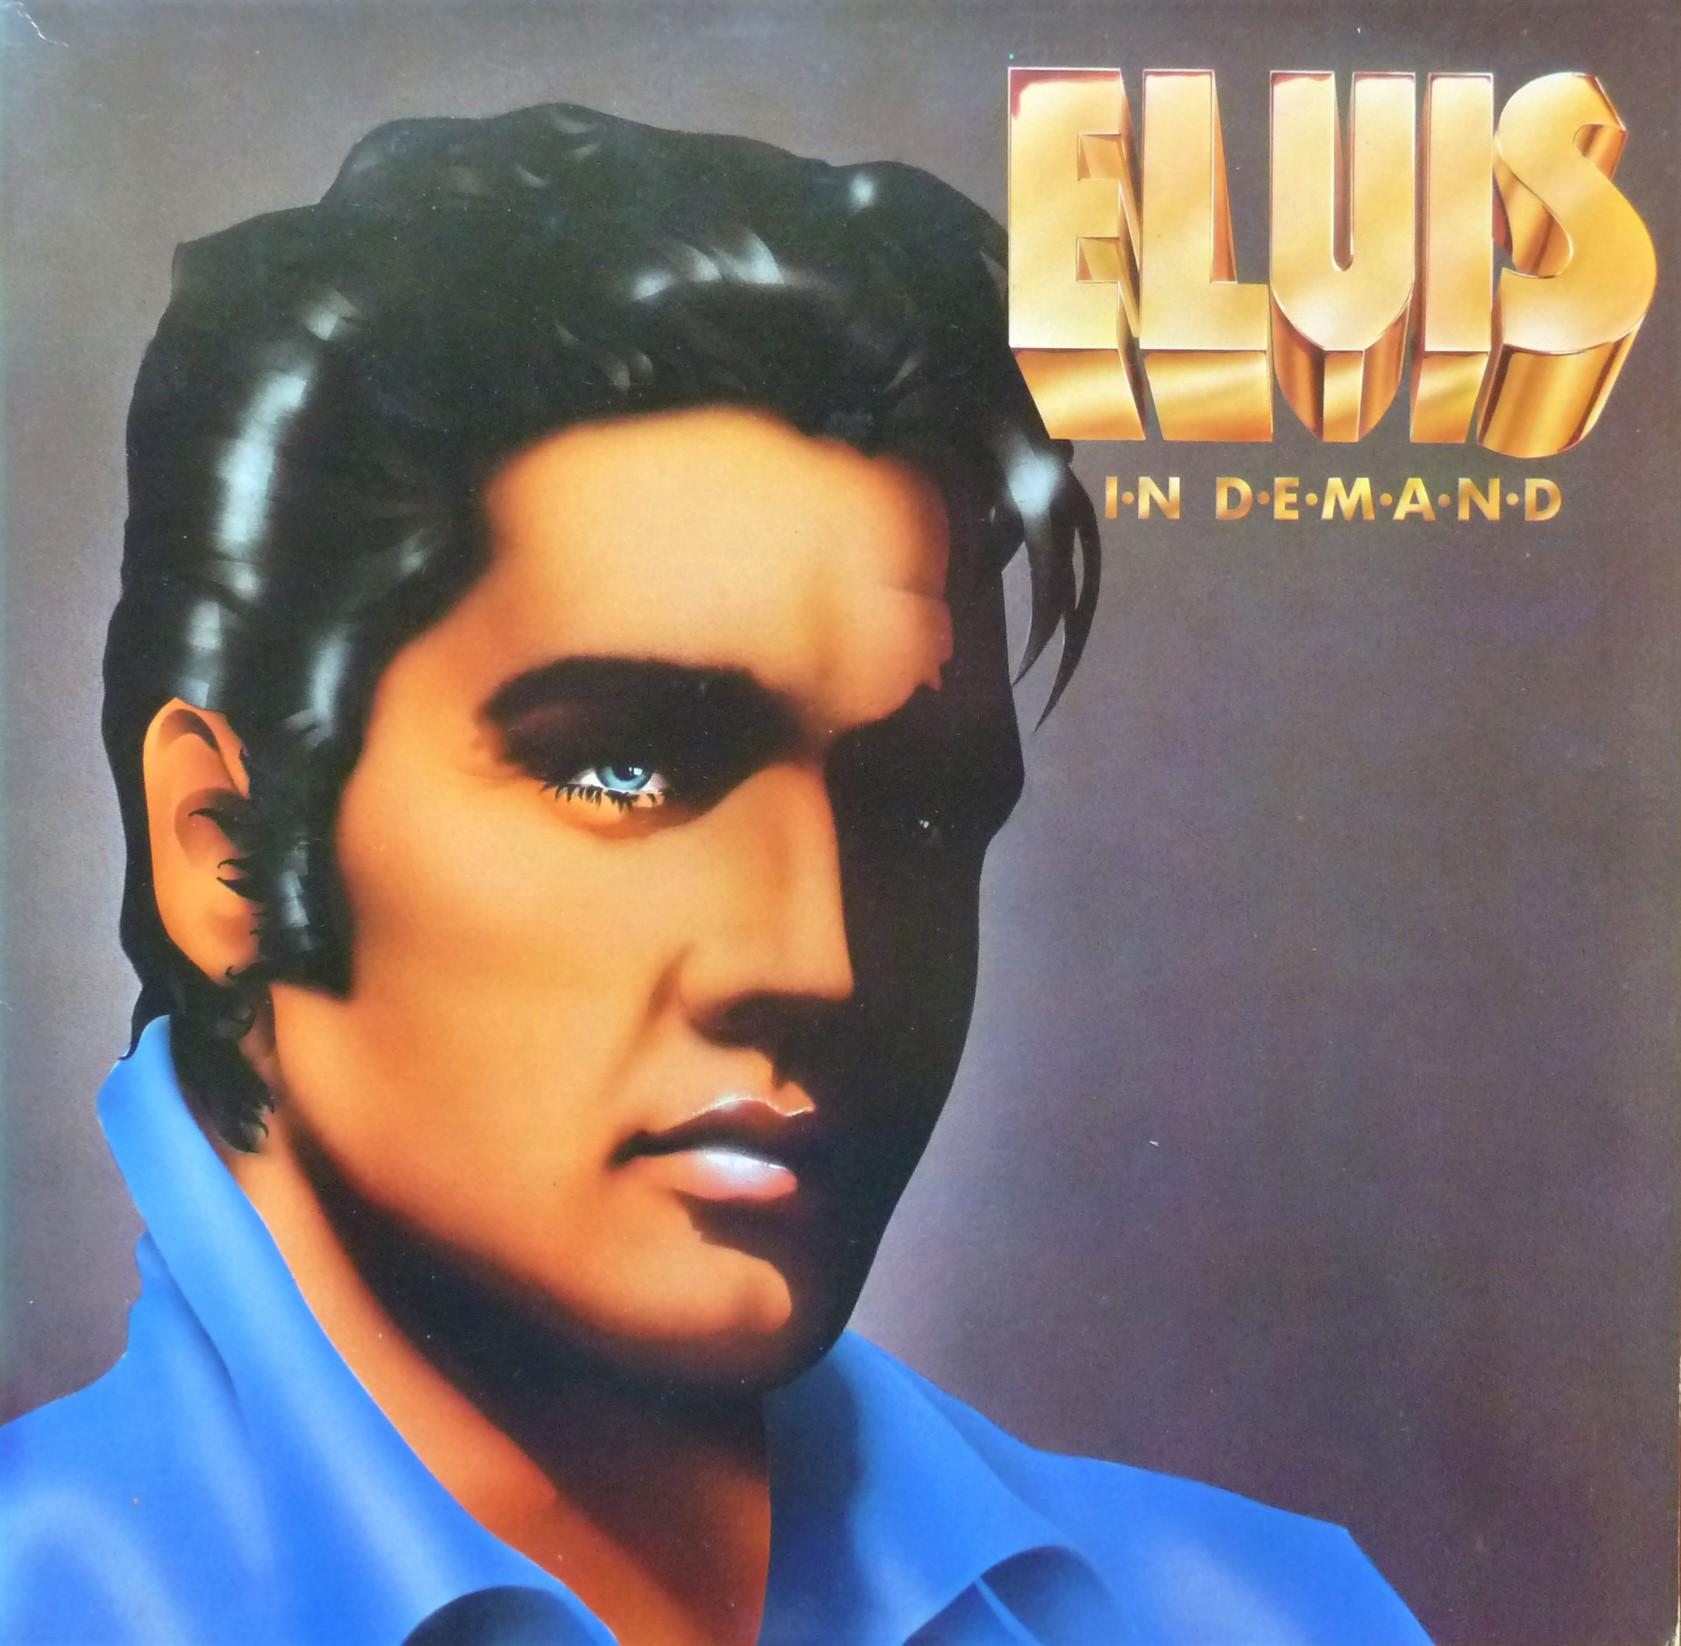 ELVIS IN DEMAND Elvisindemand83sn3fro1supa